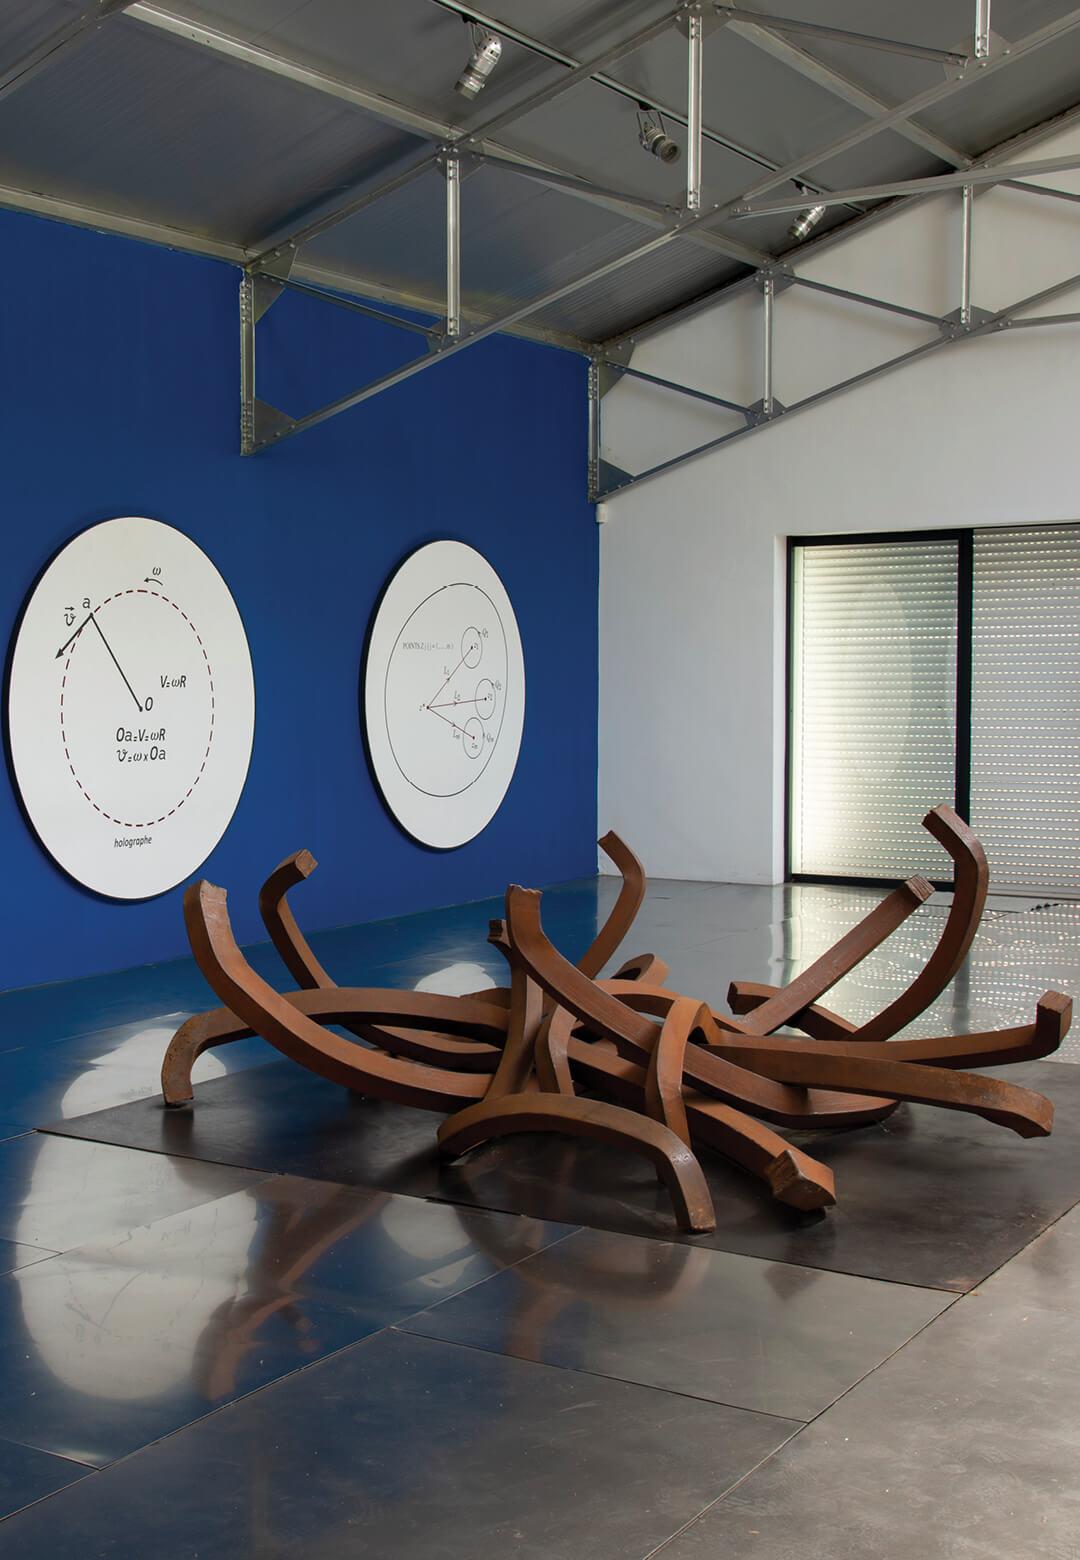 Images of work by Bernar Venet installed at the artist's home in Le Muy, France | Bernar Venet | STIRworld